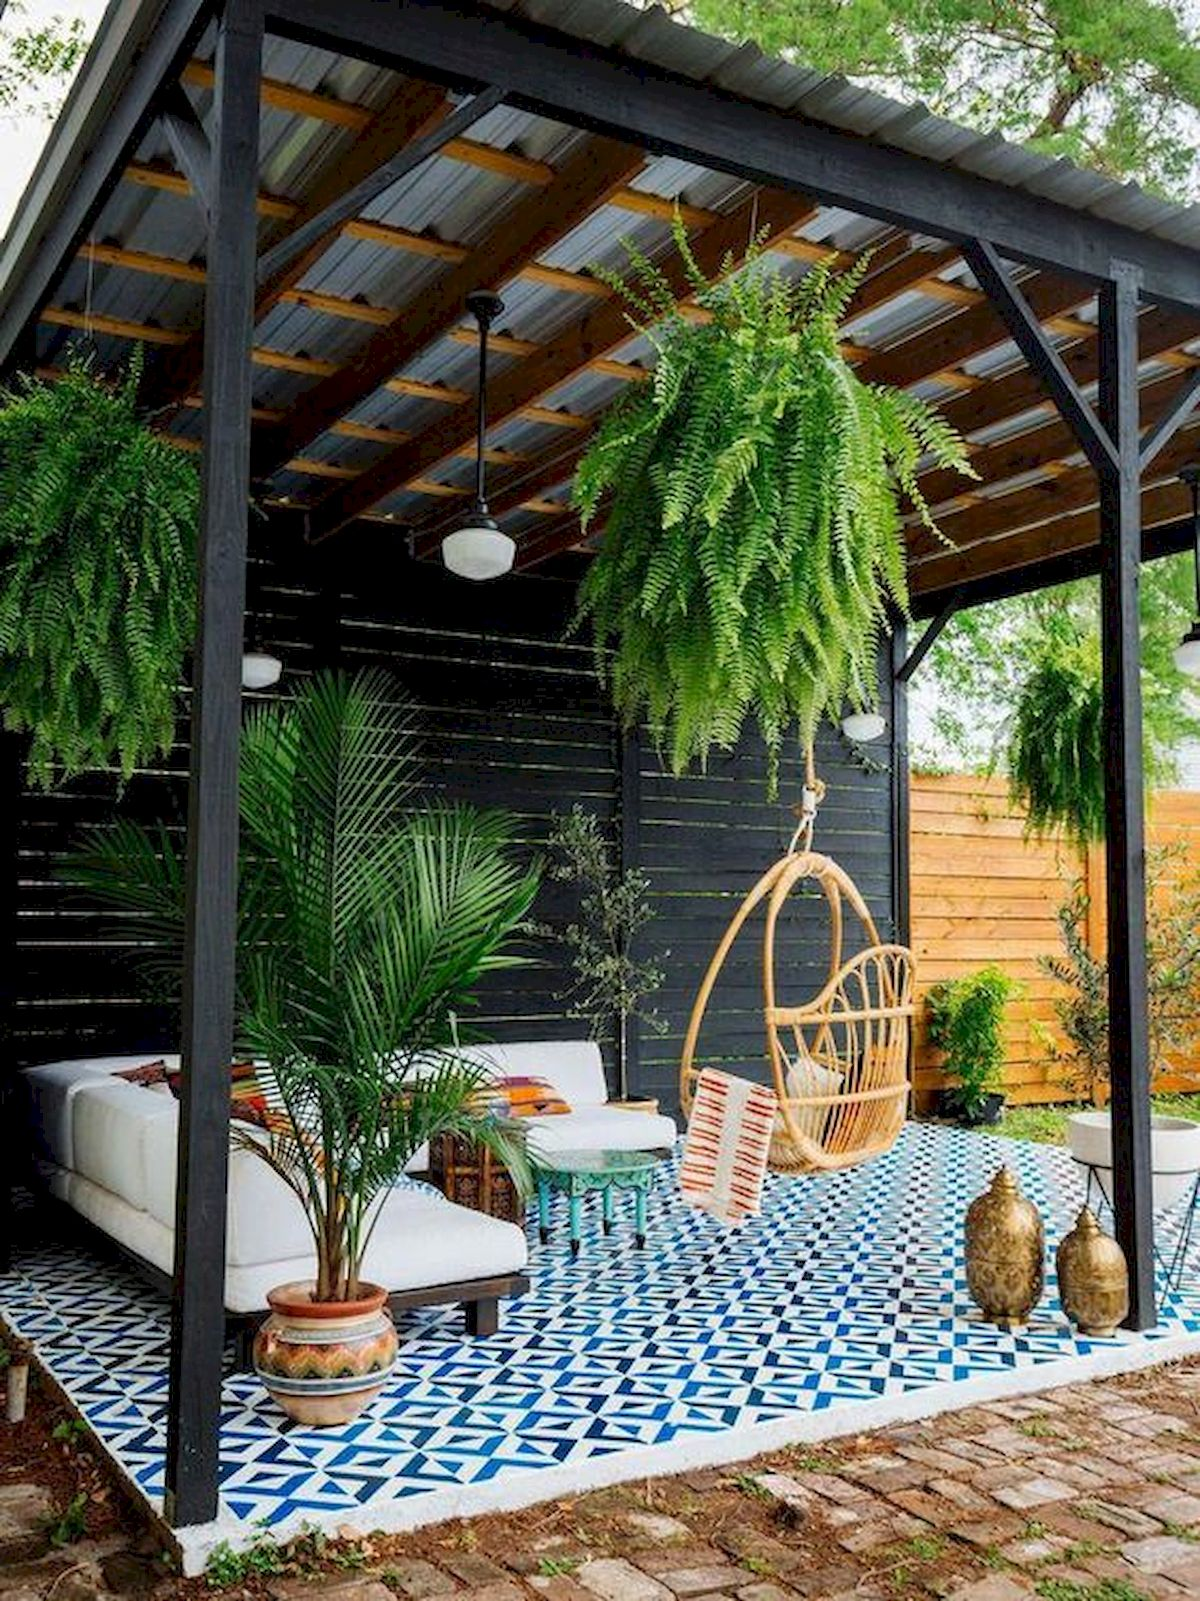 50 Awesome DIY Hanging Plants Ideas For Modern Backyard Garden (10)